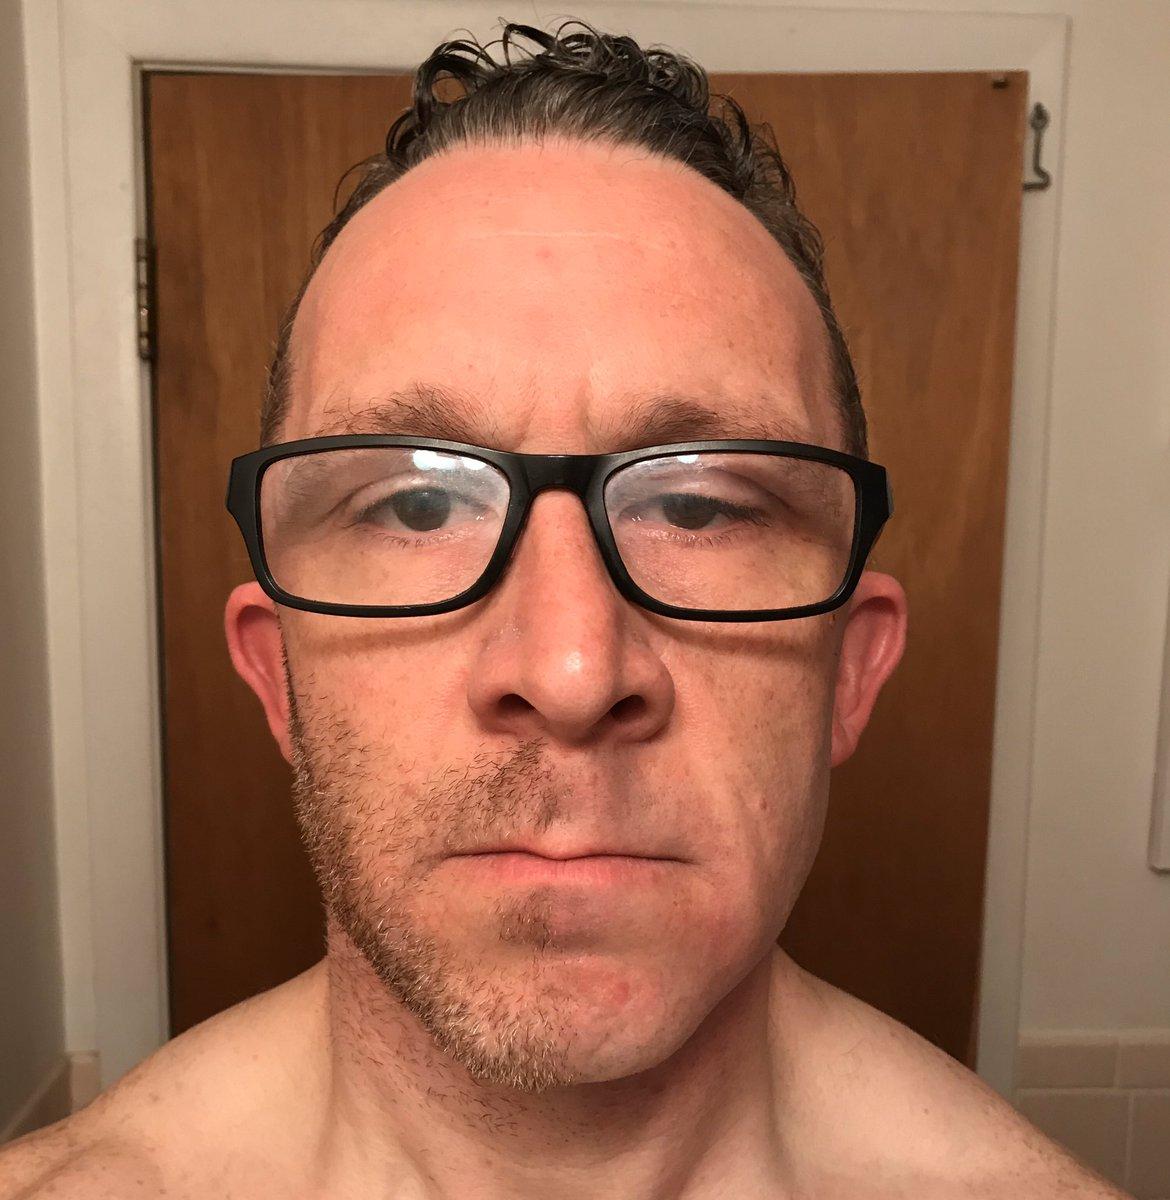 Day 6 of 1/2 beard till we can go out #COVID19  #SaturdayMotivation #halfbeard #homealone #SocialDistanacing #alonetogether #BeardGang #beards #bostoncomedianspic.twitter.com/cImlzfJOCJ